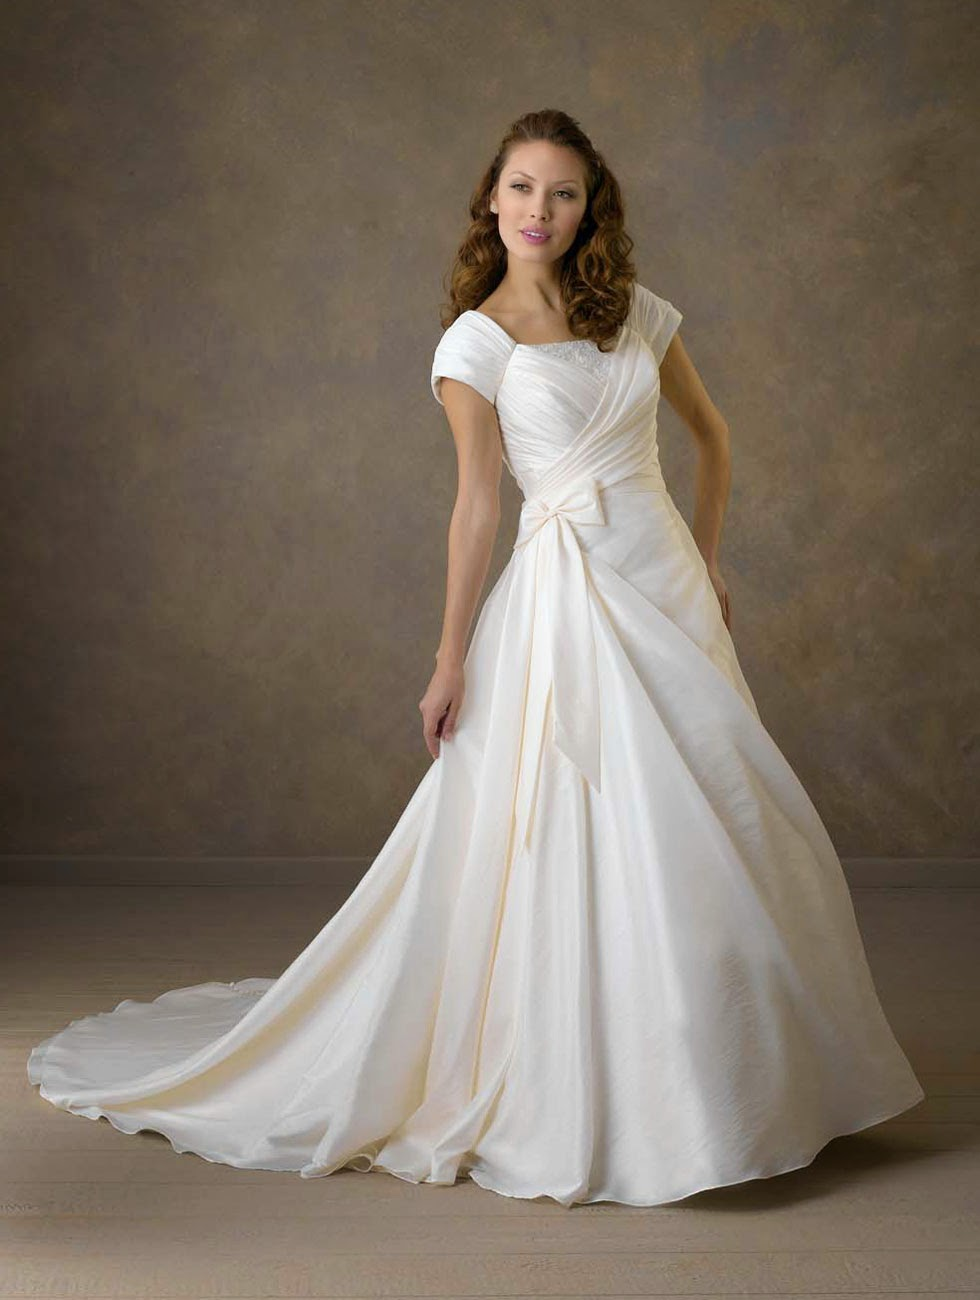 Cheap White Wedding Dresses Under 100 Dollars Photos HD